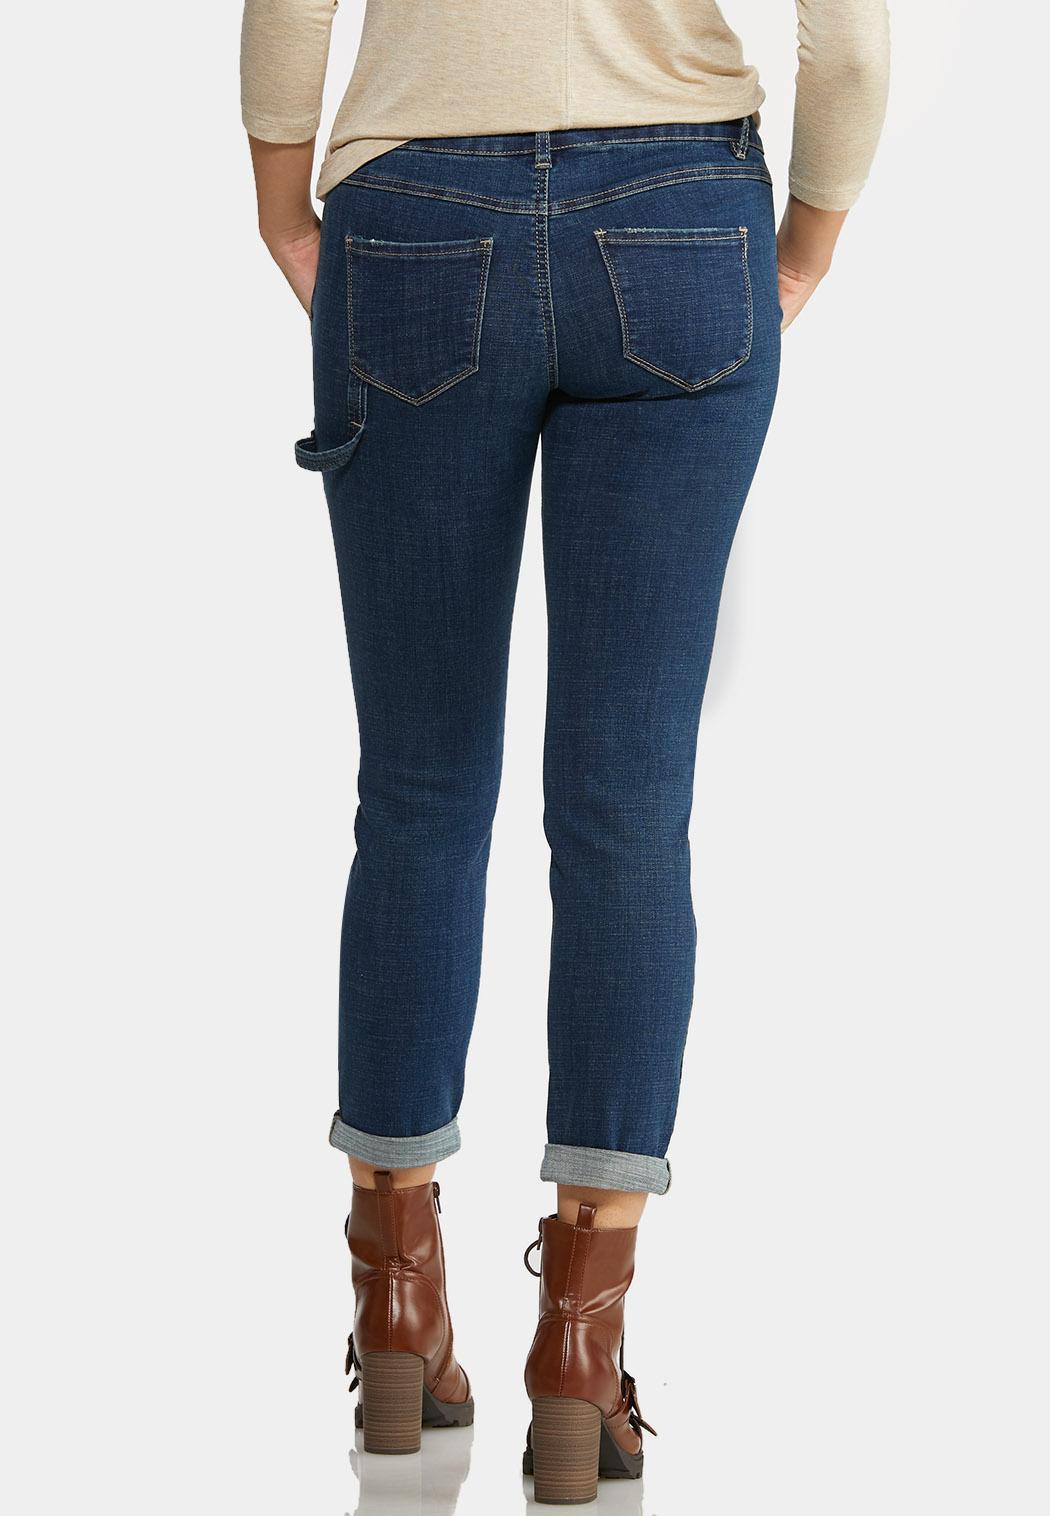 Skinny Carpenter Jeans (Item #43906382)